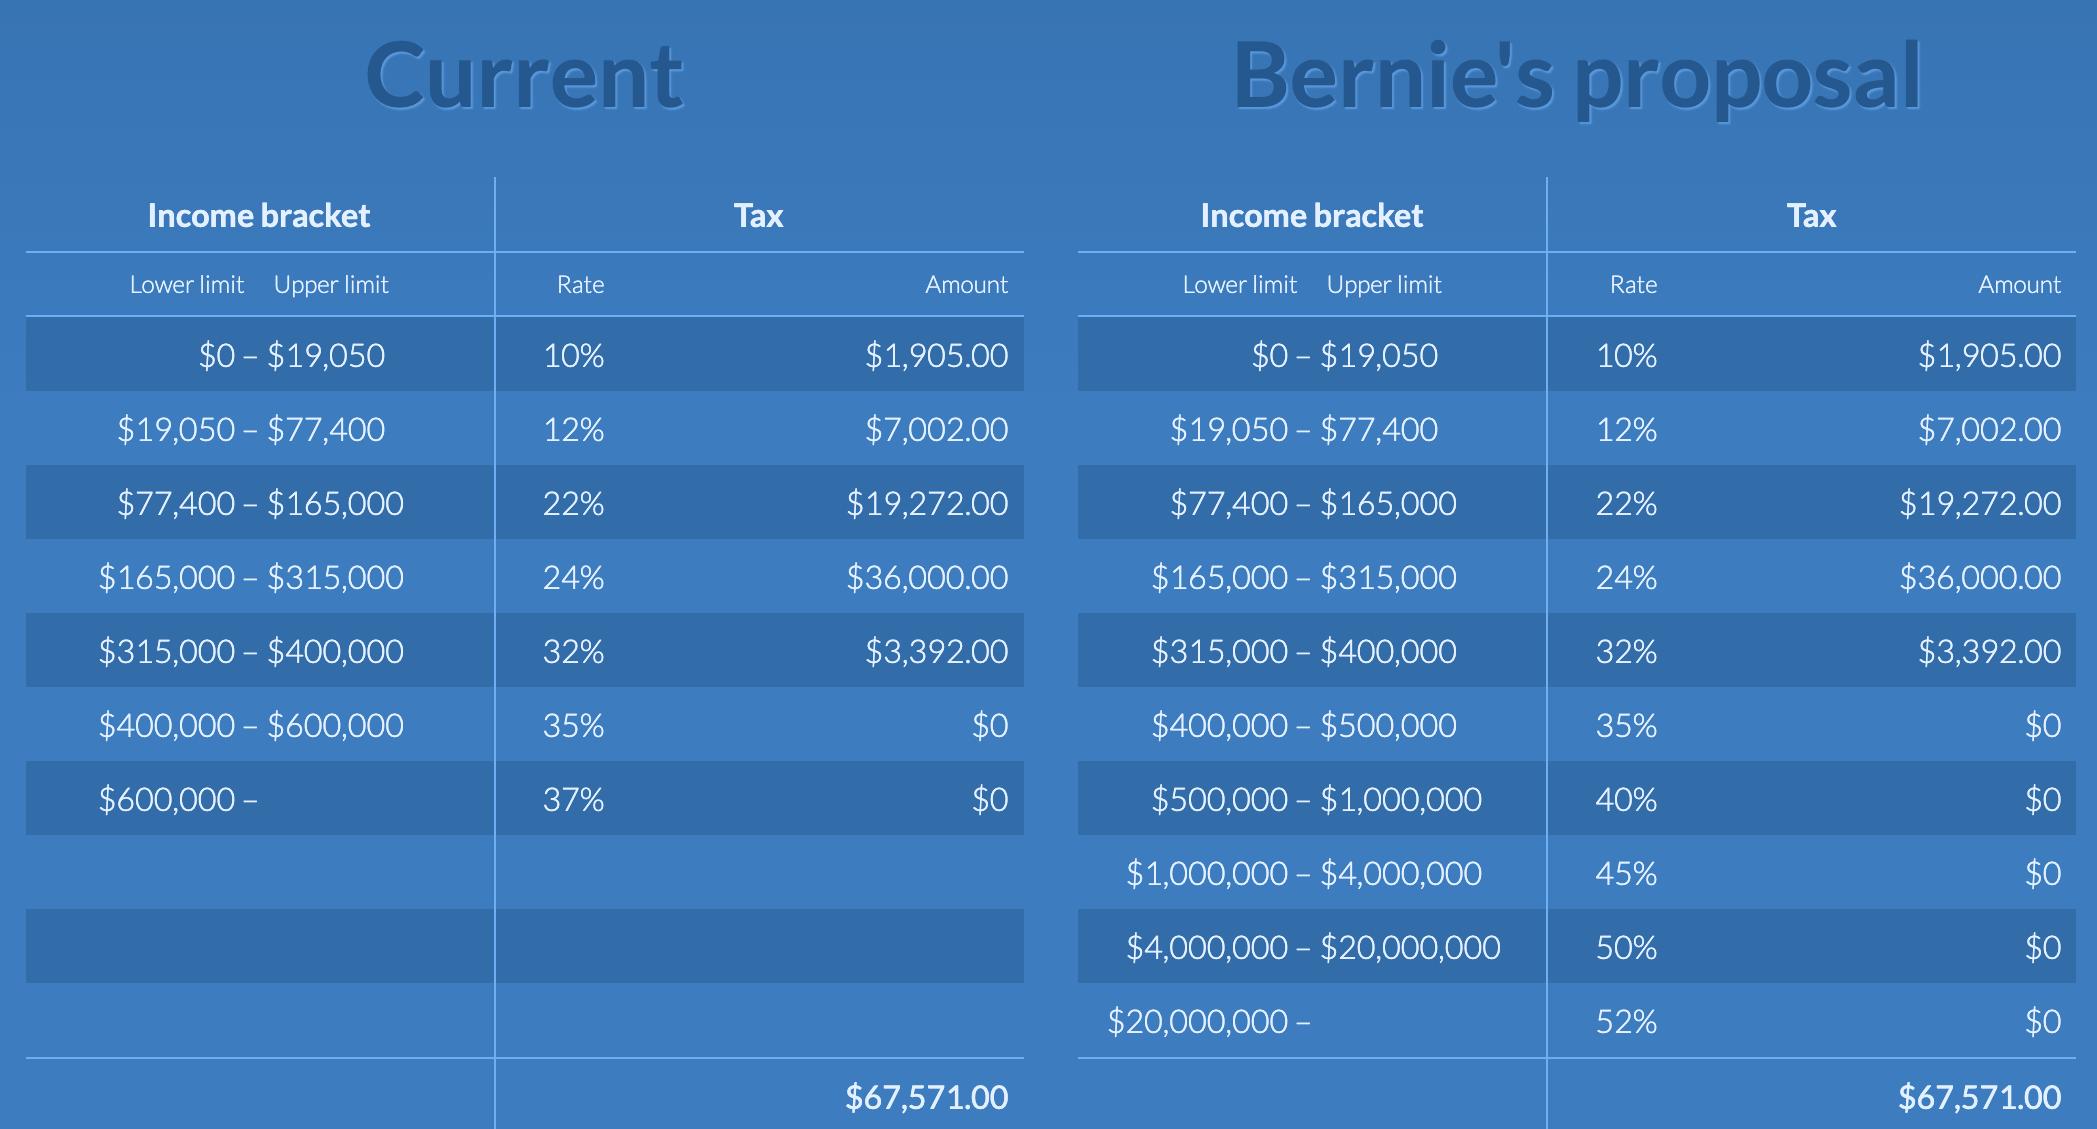 Bernie Sanders' Proposed Marginal Income Tax Rates